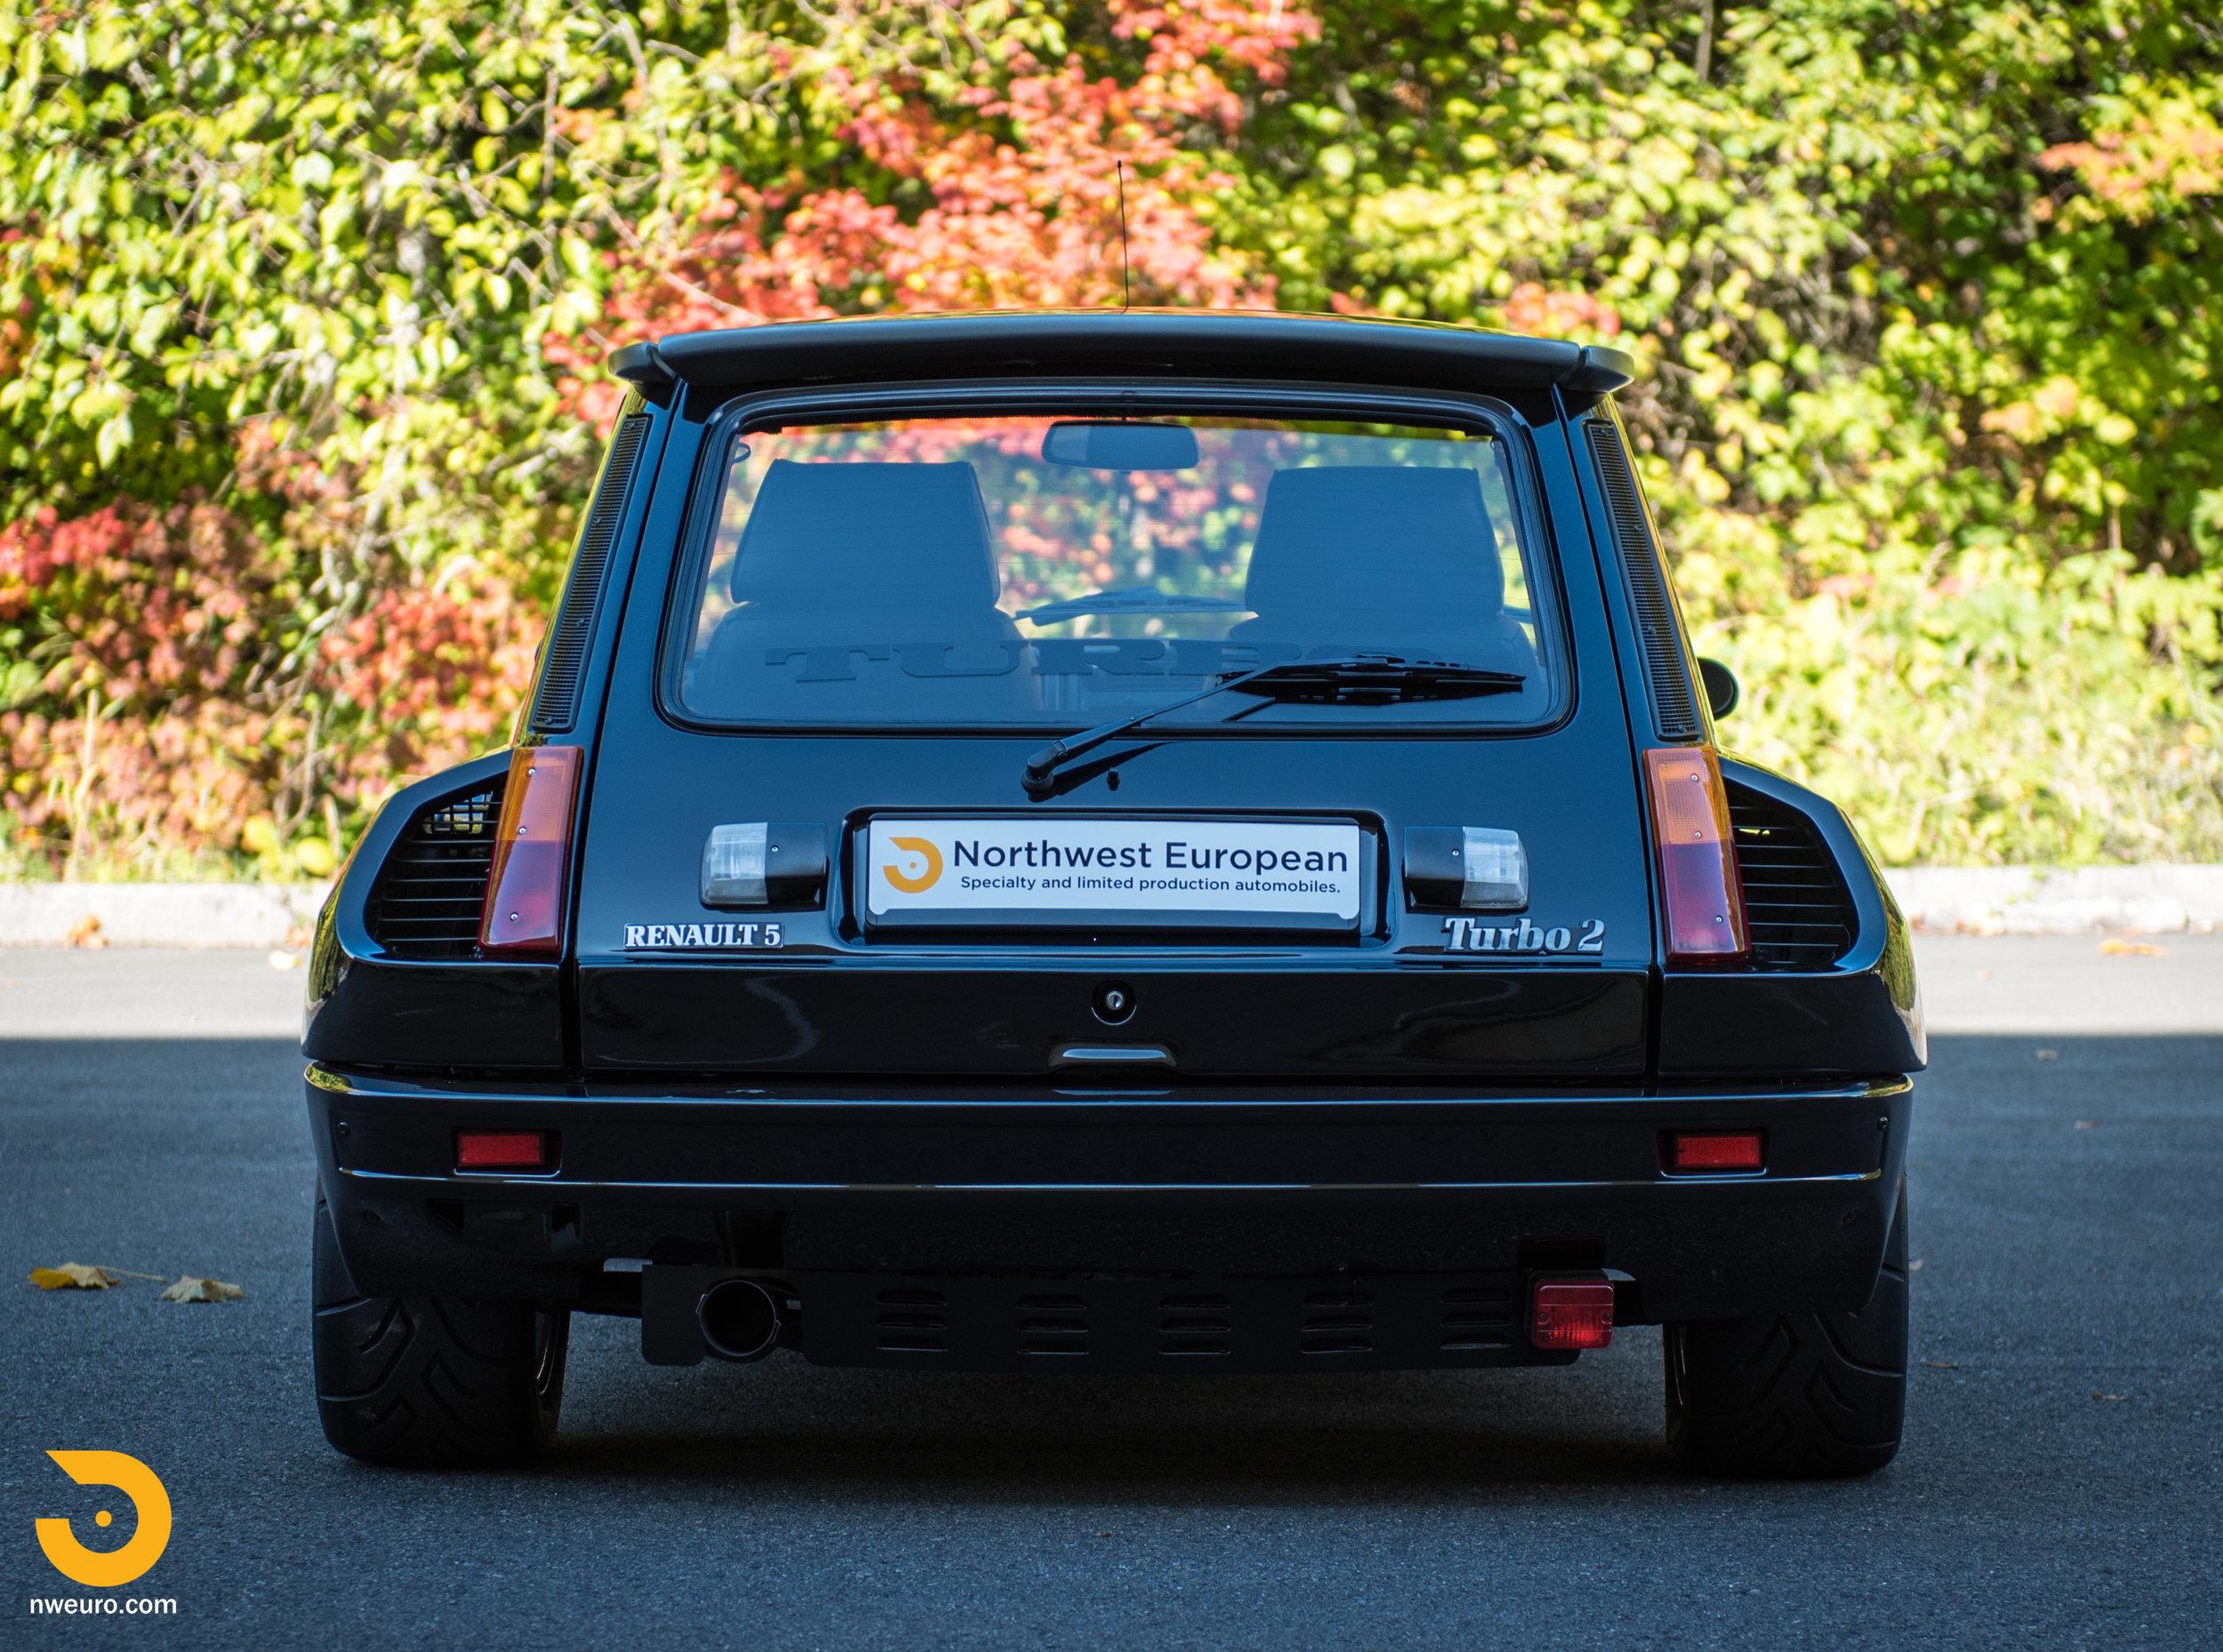 1983 Renault R5 Turbo 2 Black-55.jpg